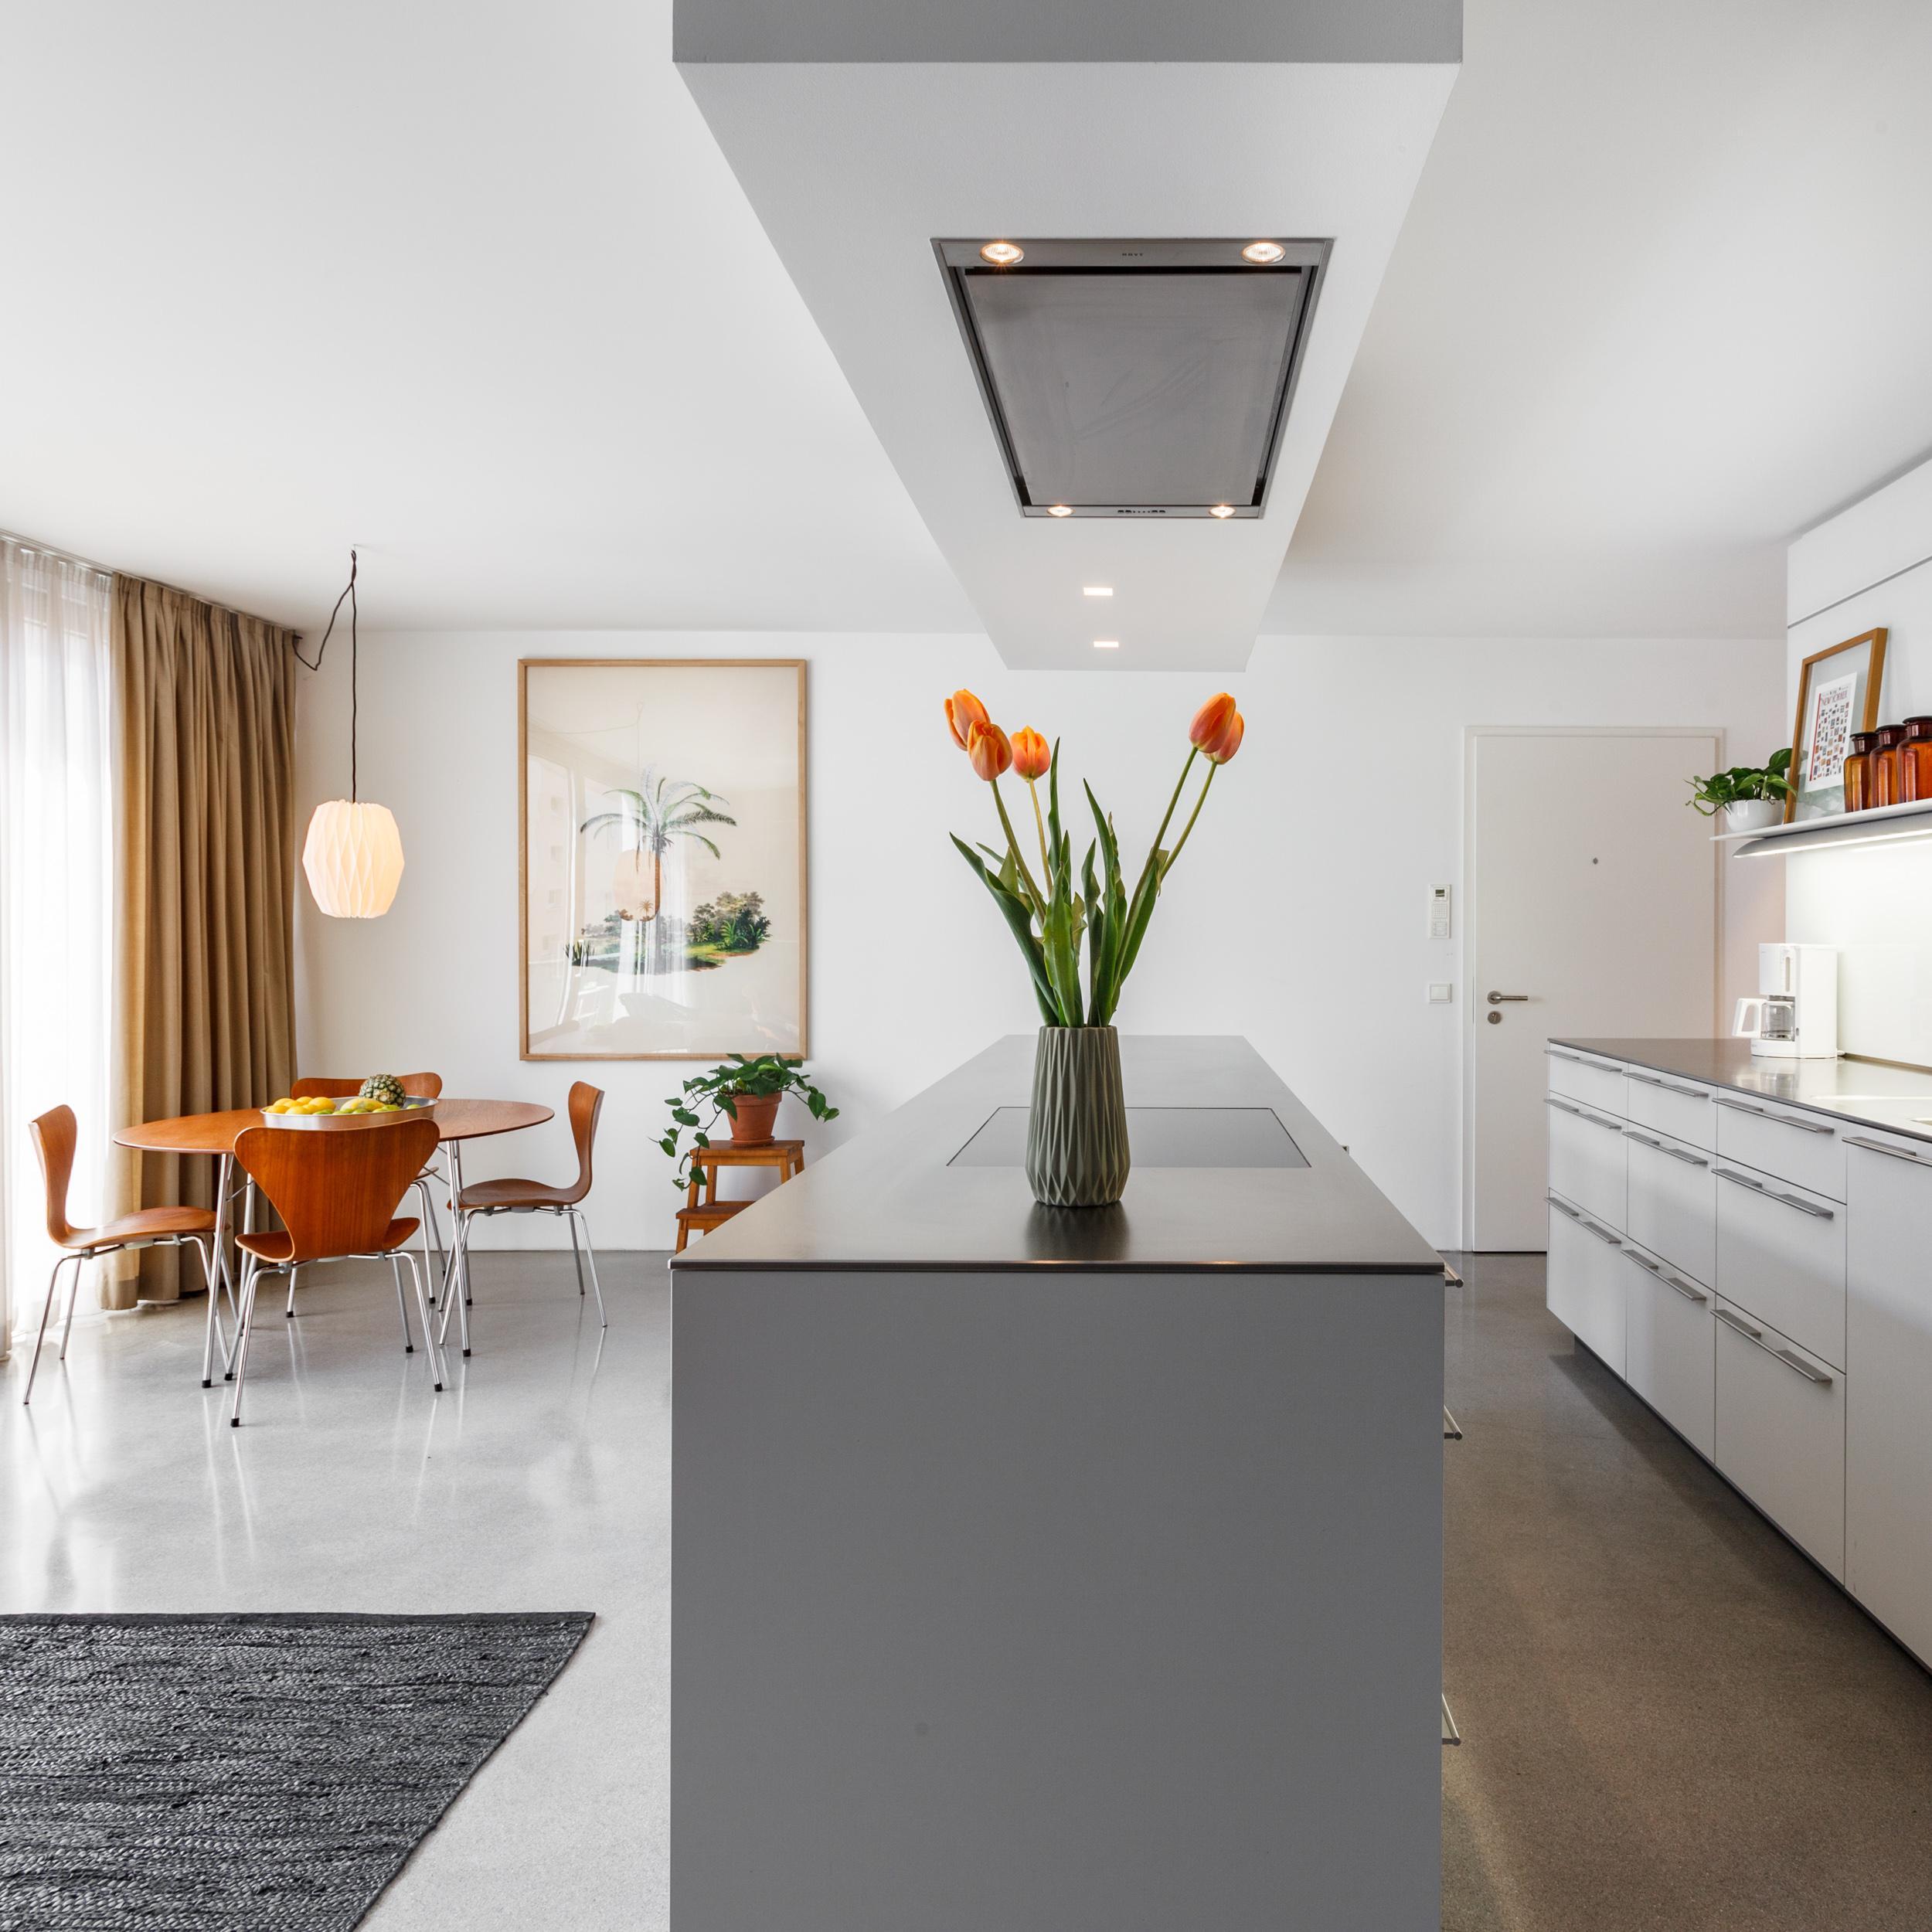 vintage k che bilder ideen couchstyle. Black Bedroom Furniture Sets. Home Design Ideas